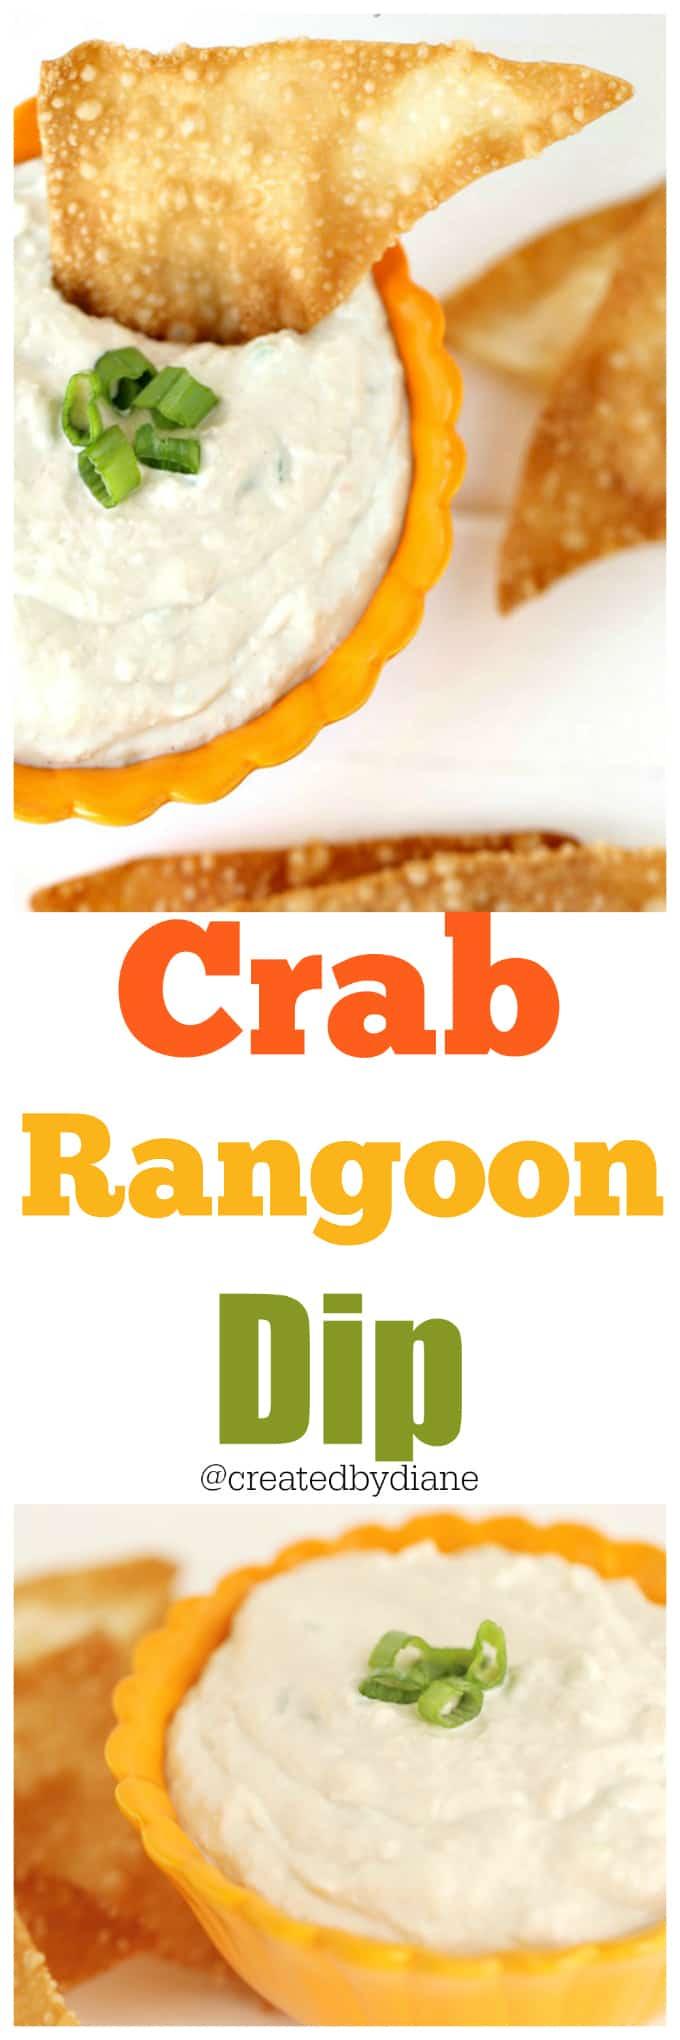 crab rangoon dip @createdbydiane